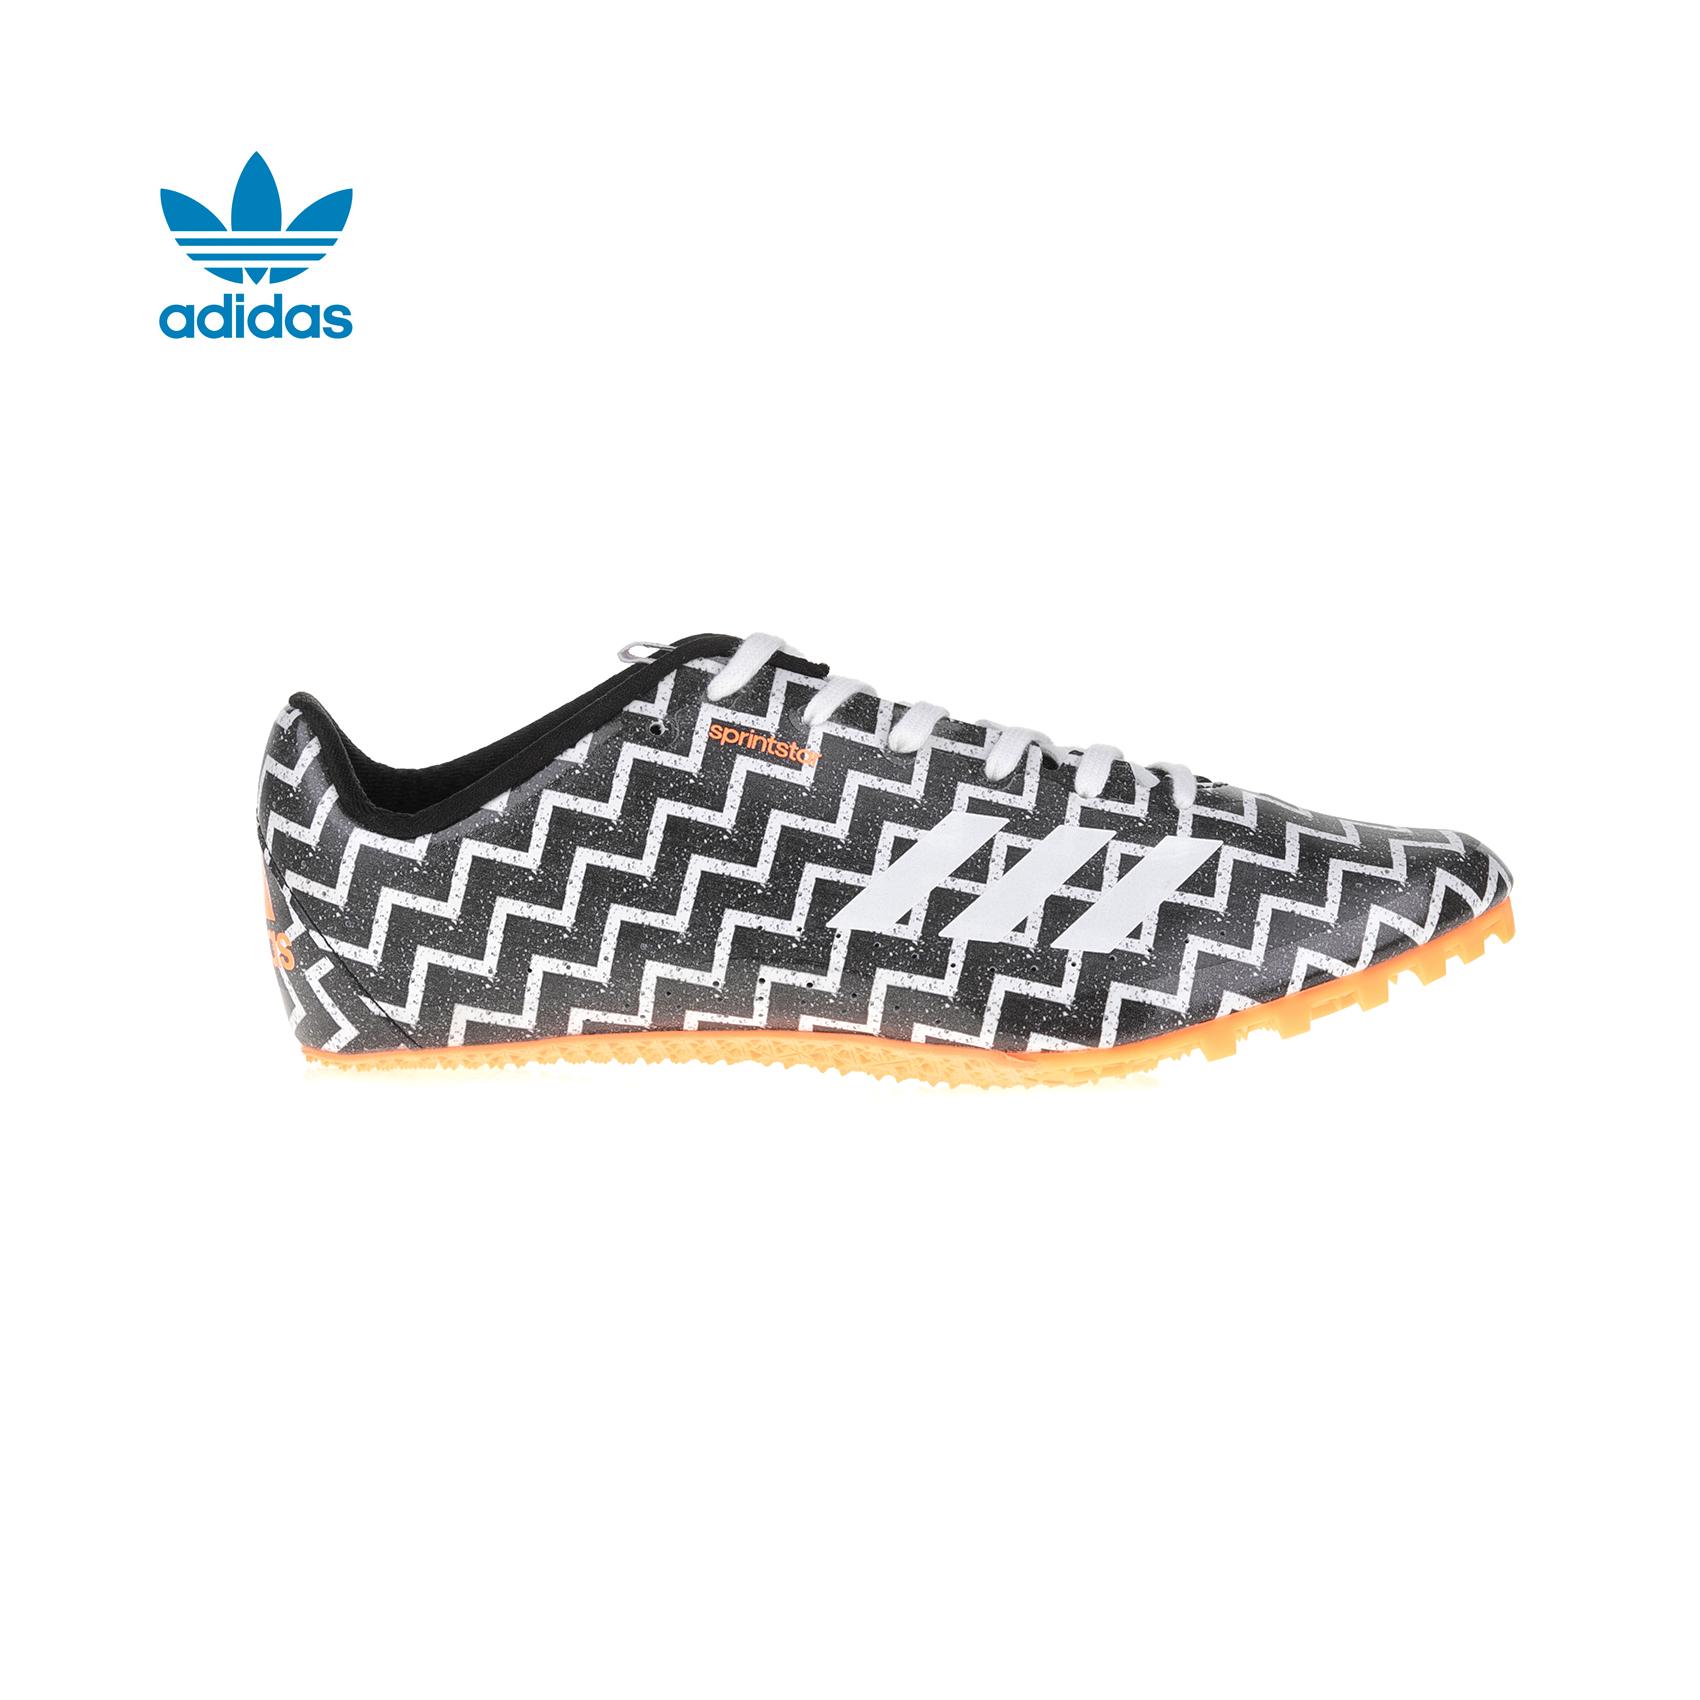 adidas Originals - Ανδρικά παπούτσια adidas sprintstar μαύρα ανδρικά παπούτσια αθλητικά running